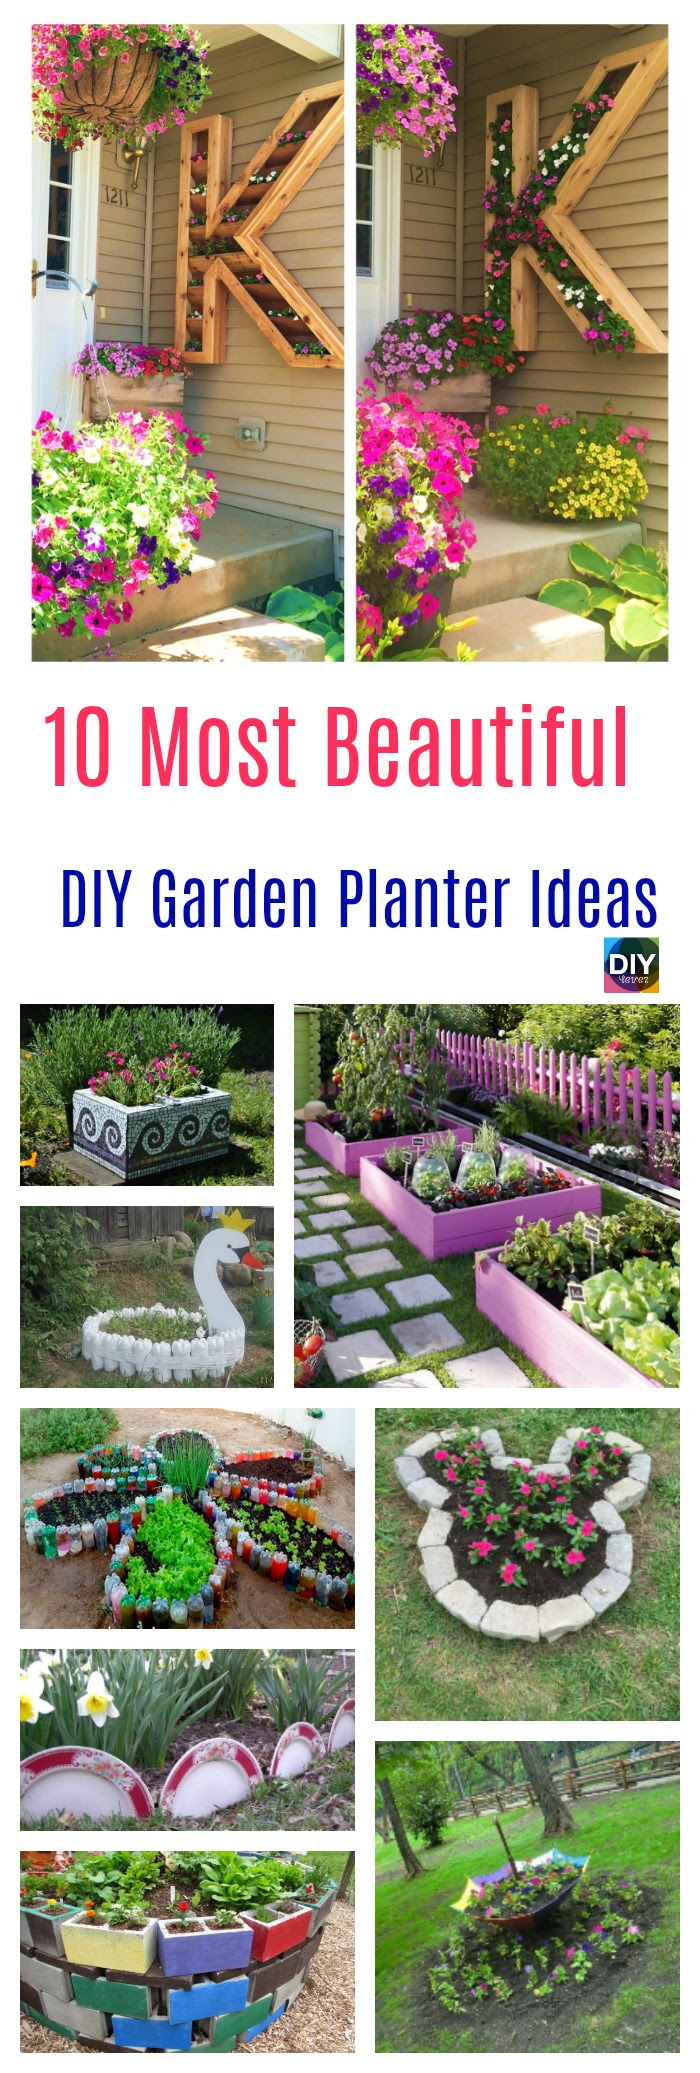 28 Most Beautiful DIY Garden Planter Ideas - DIY 28 EVER